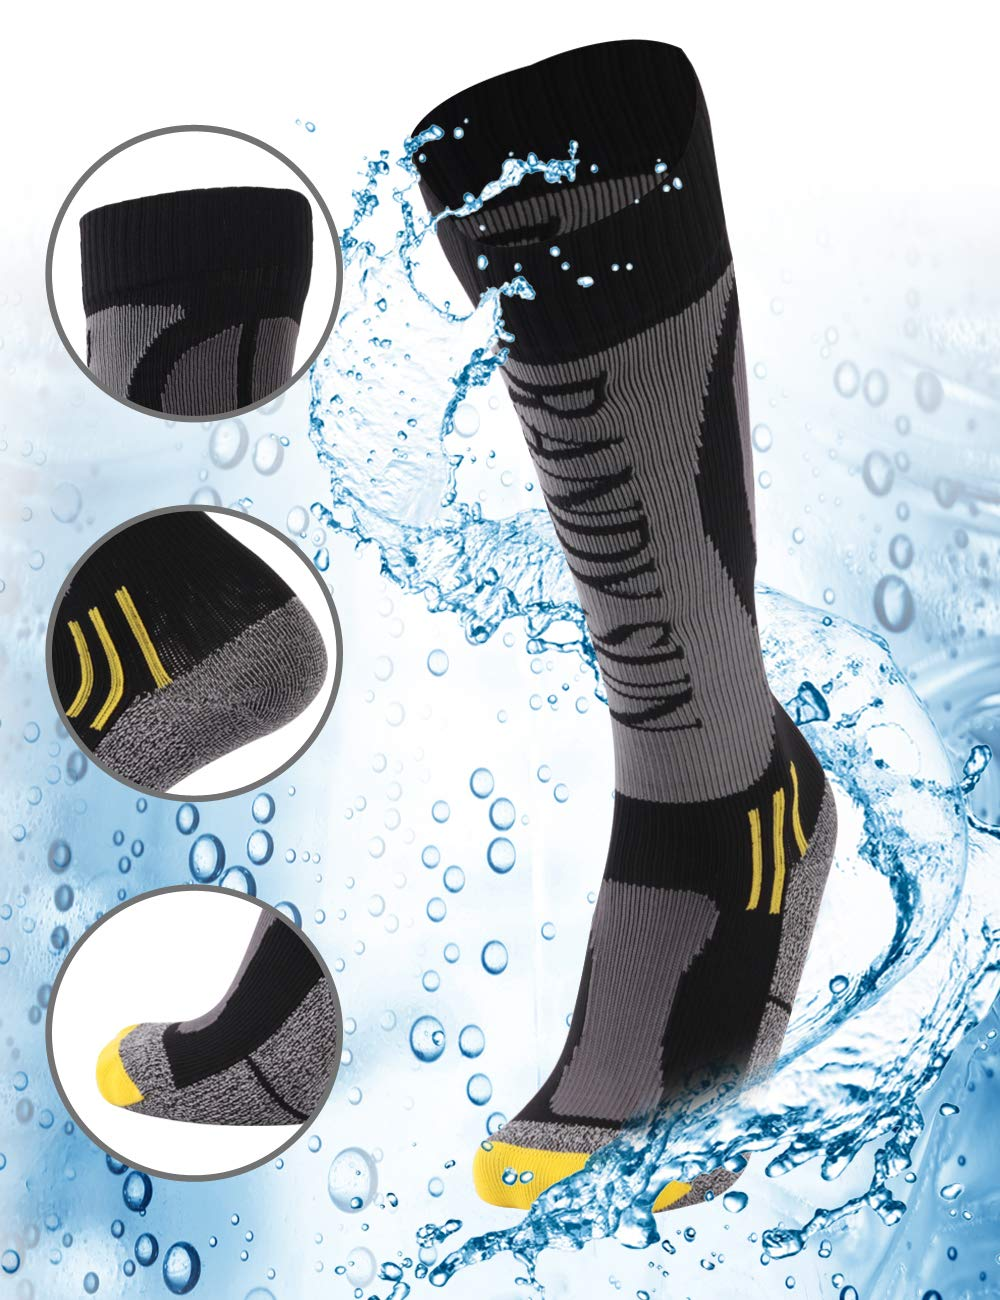 100% Waterproof Hiking Socks, Rain Socks, [SGS Certified]RANDY SUN Men's Cold-weather Comfort Socks Grey&Black Medium by RANDY SUN